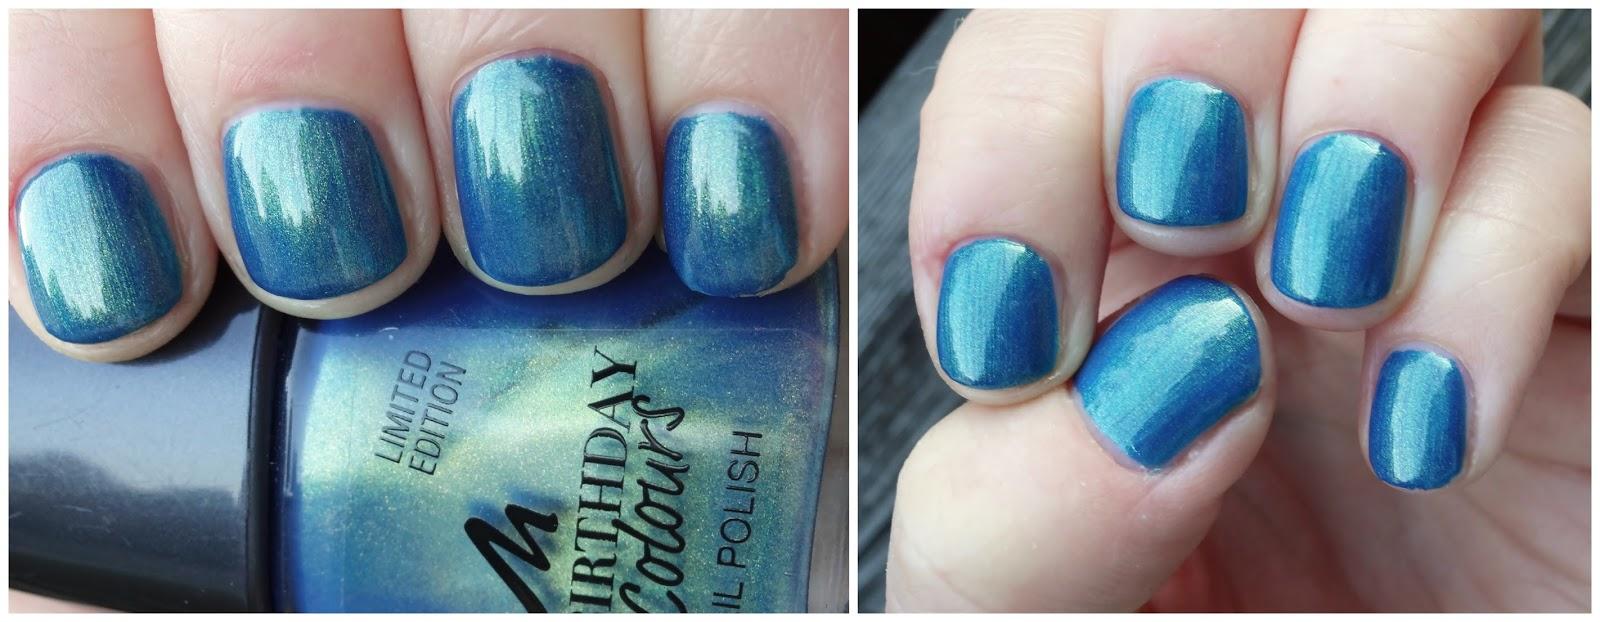 Pretty Clover Beautyblog Nagellack blau blue